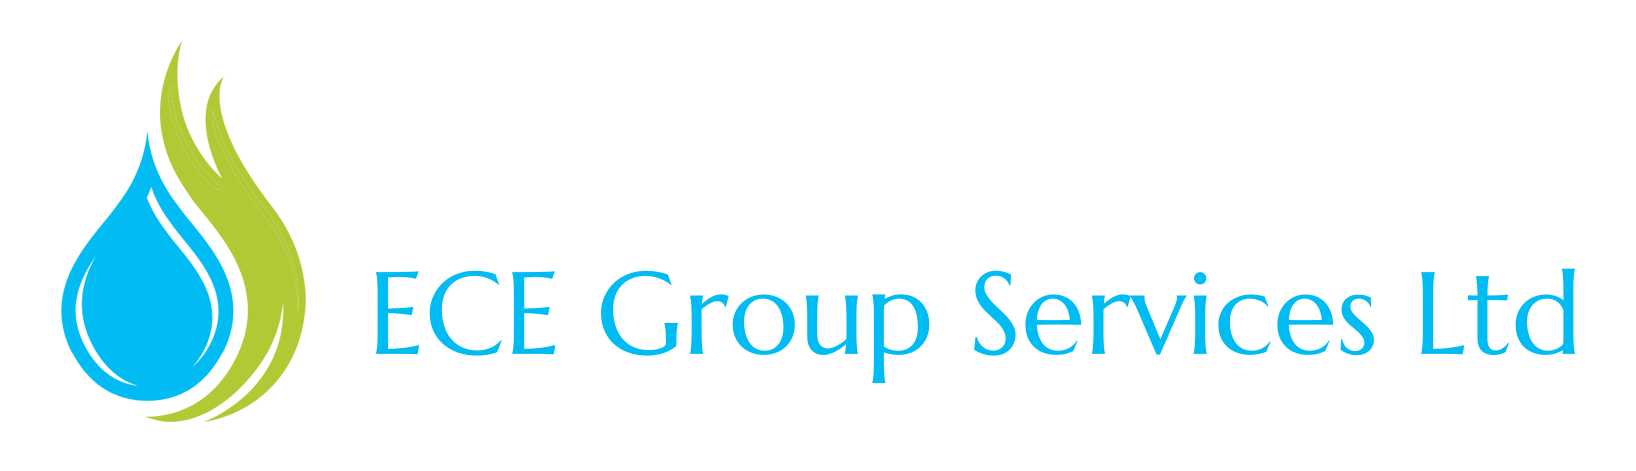 ECE Group Services